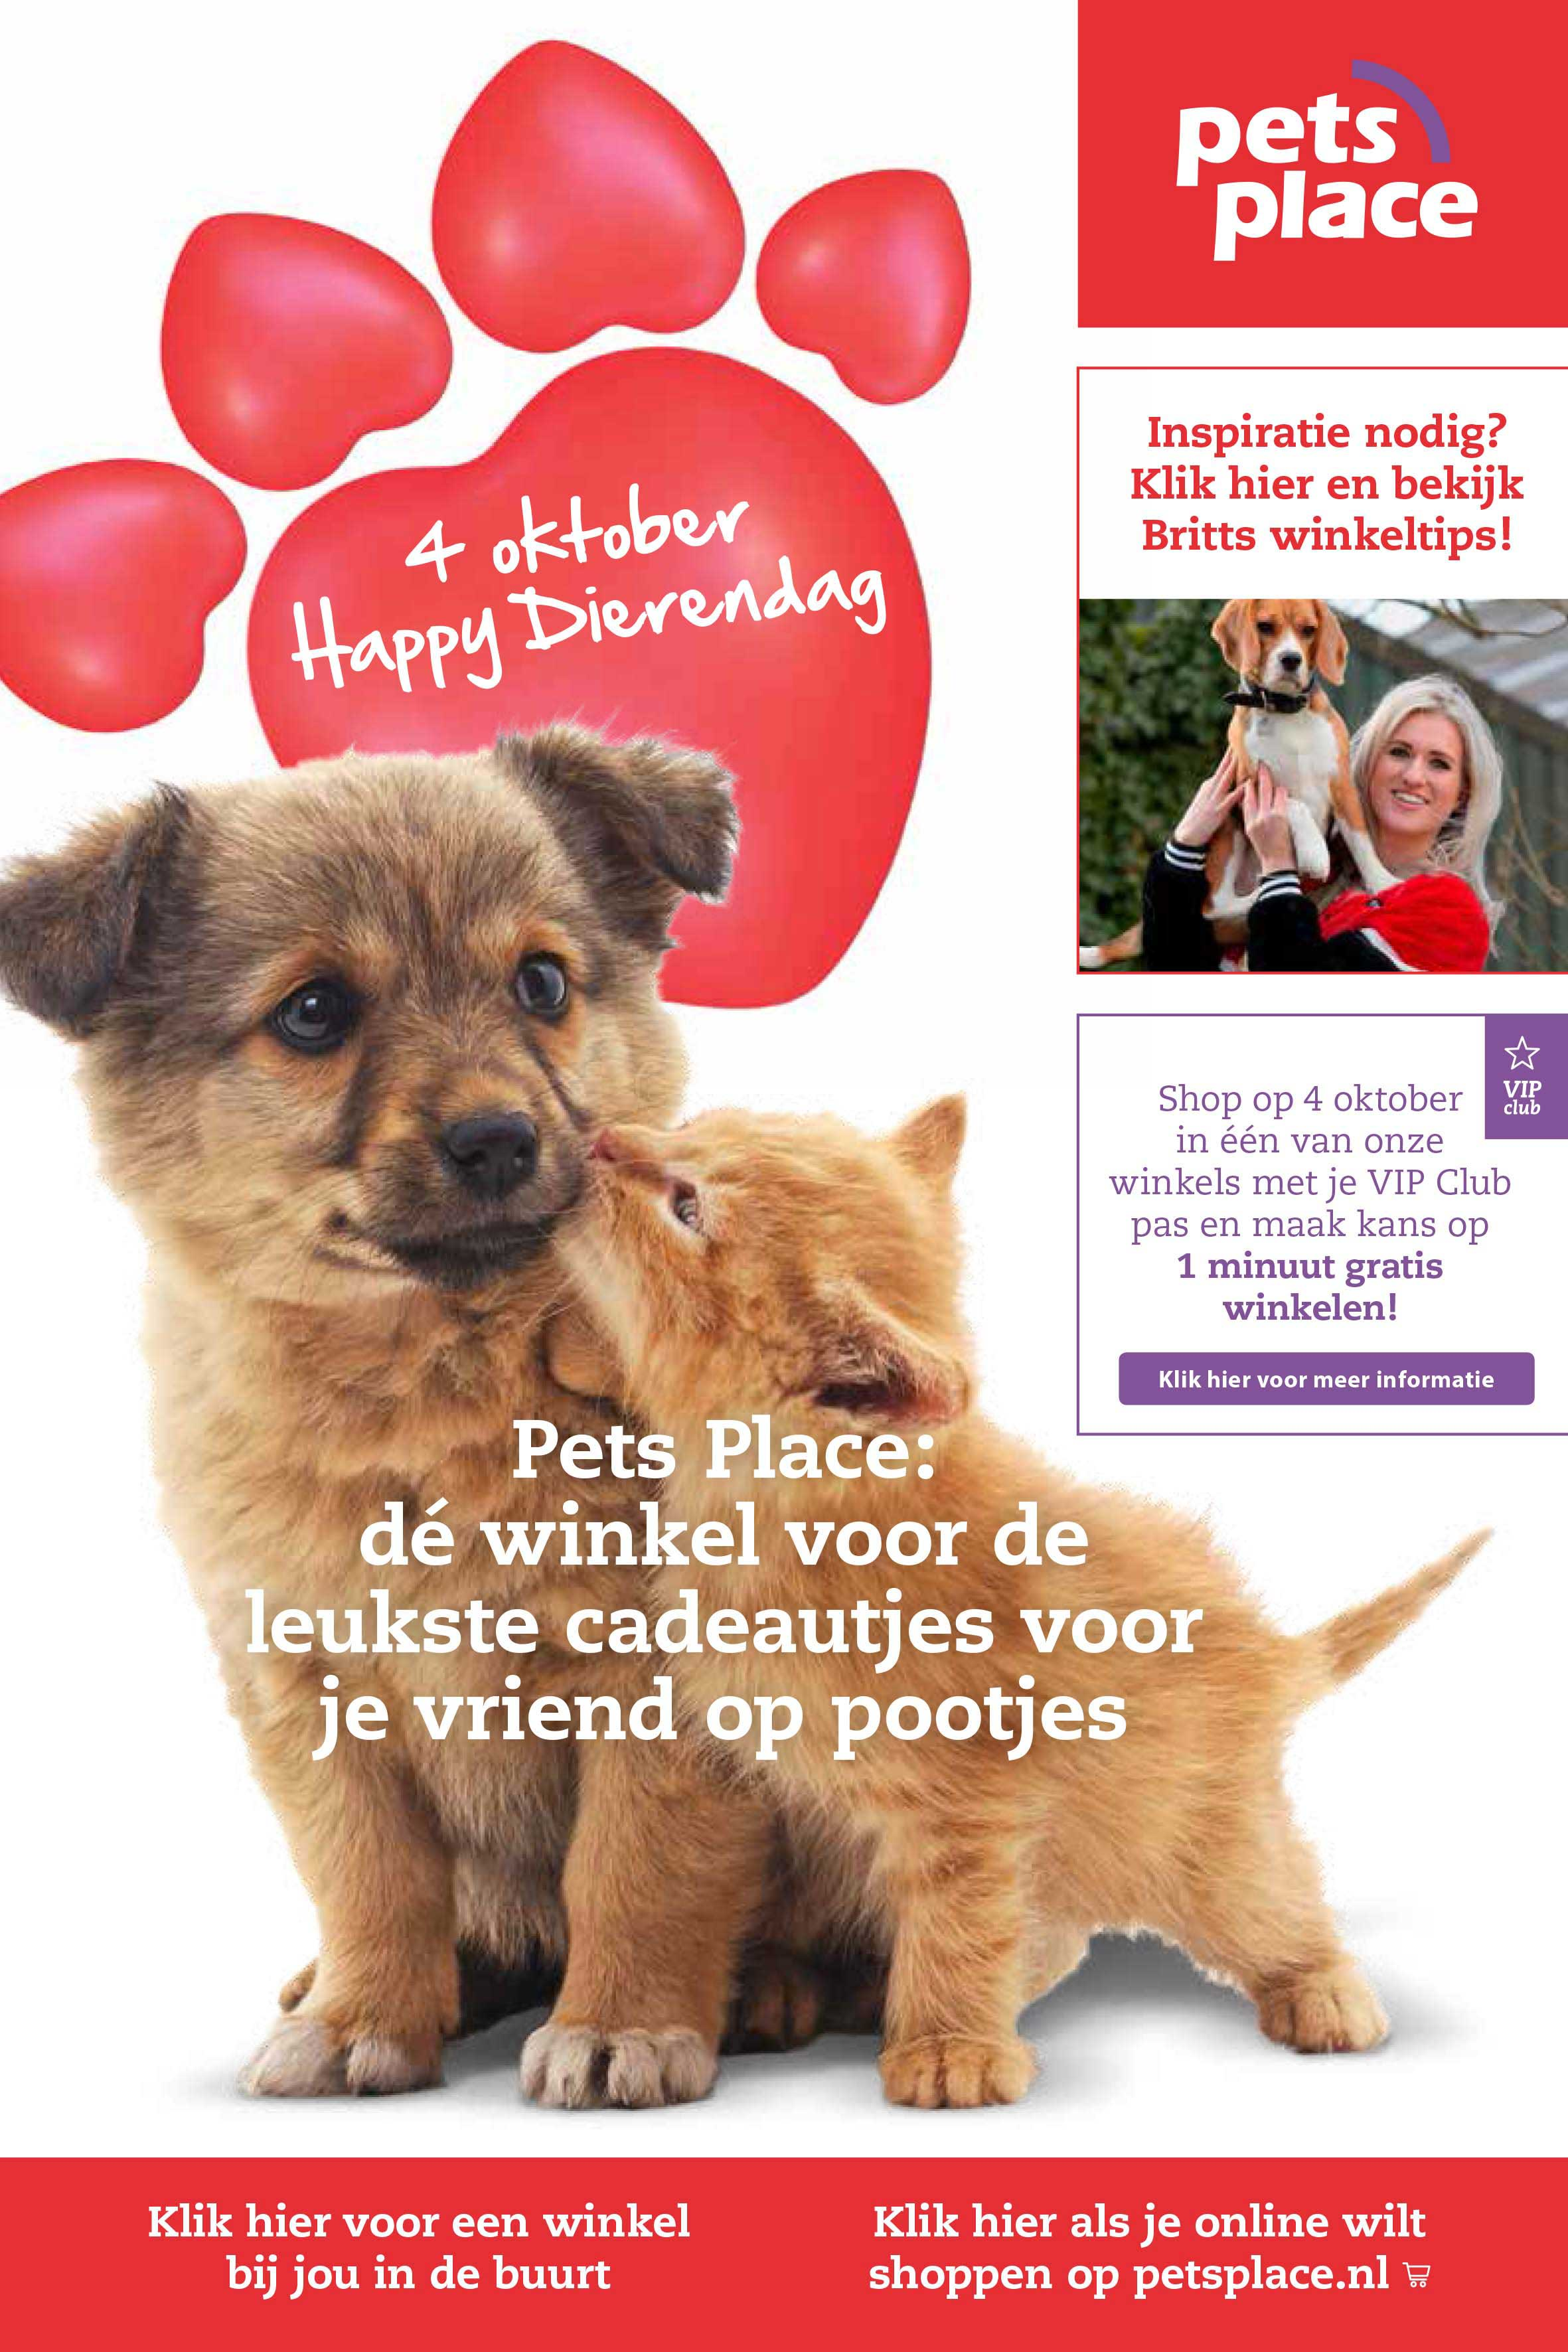 Pets Place 4 Oktober Happy Dierendag